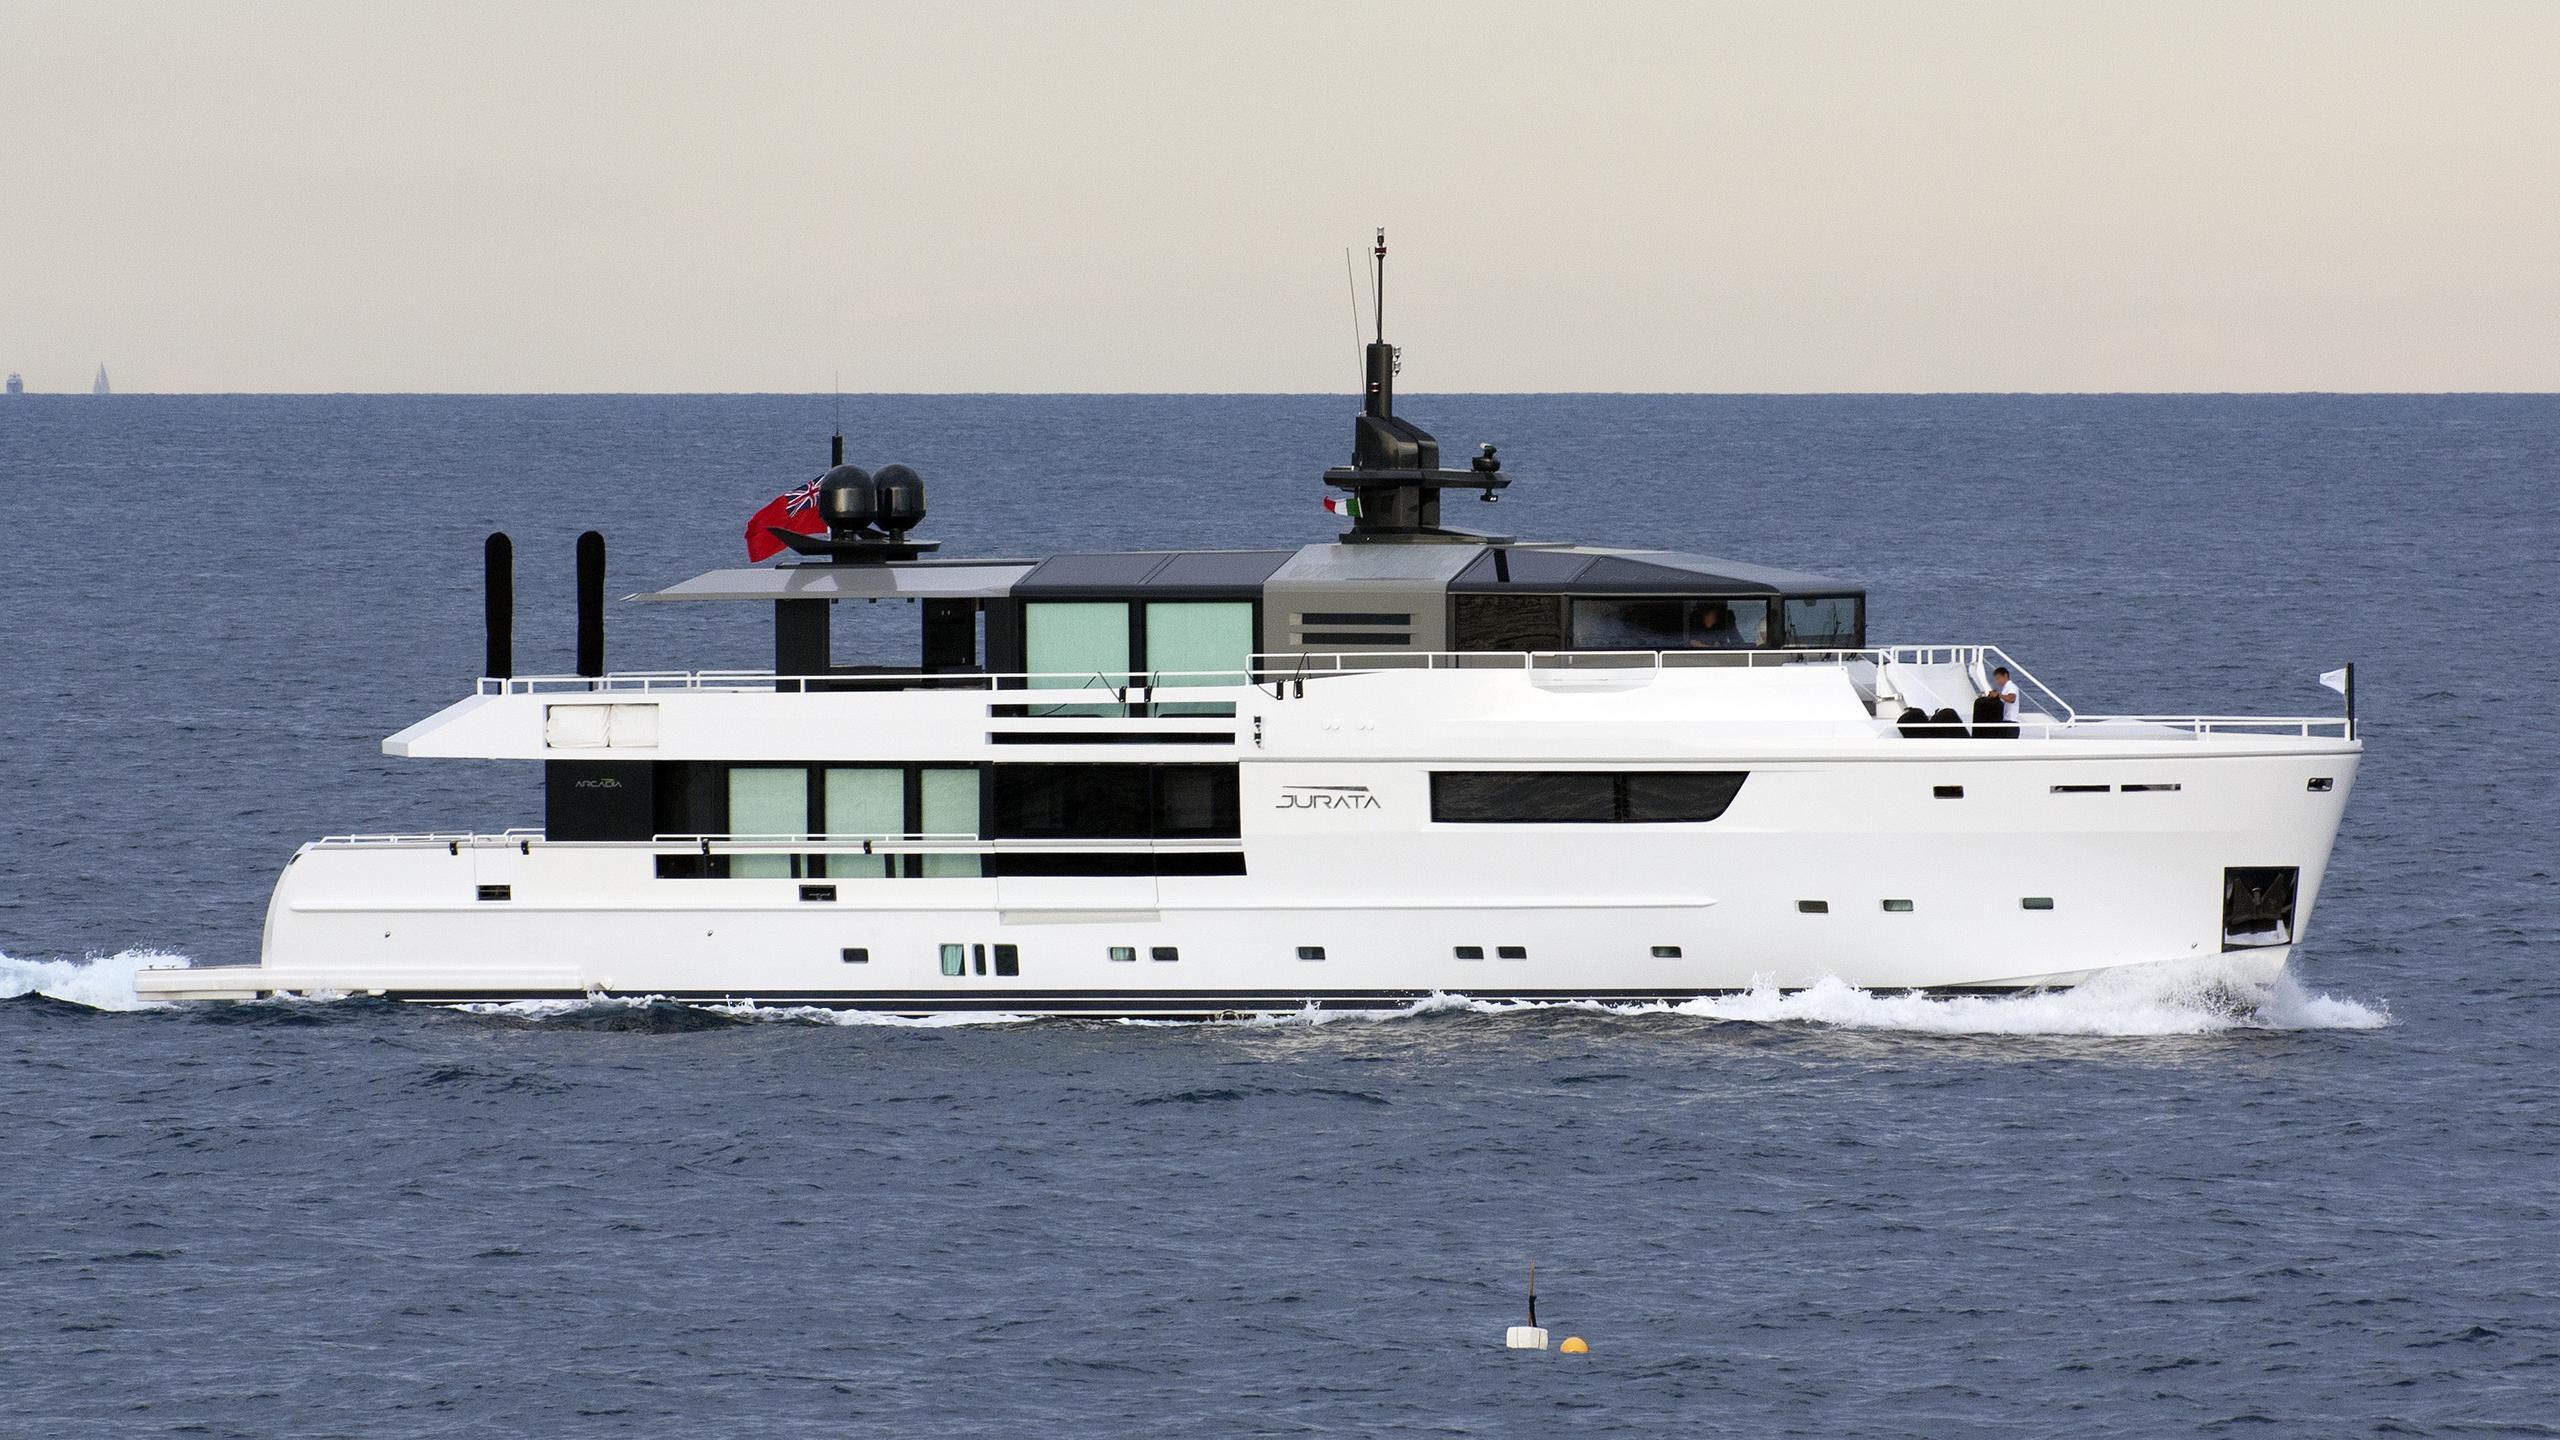 jurata motor yacht arcadia 115 2014 35m cruising profile